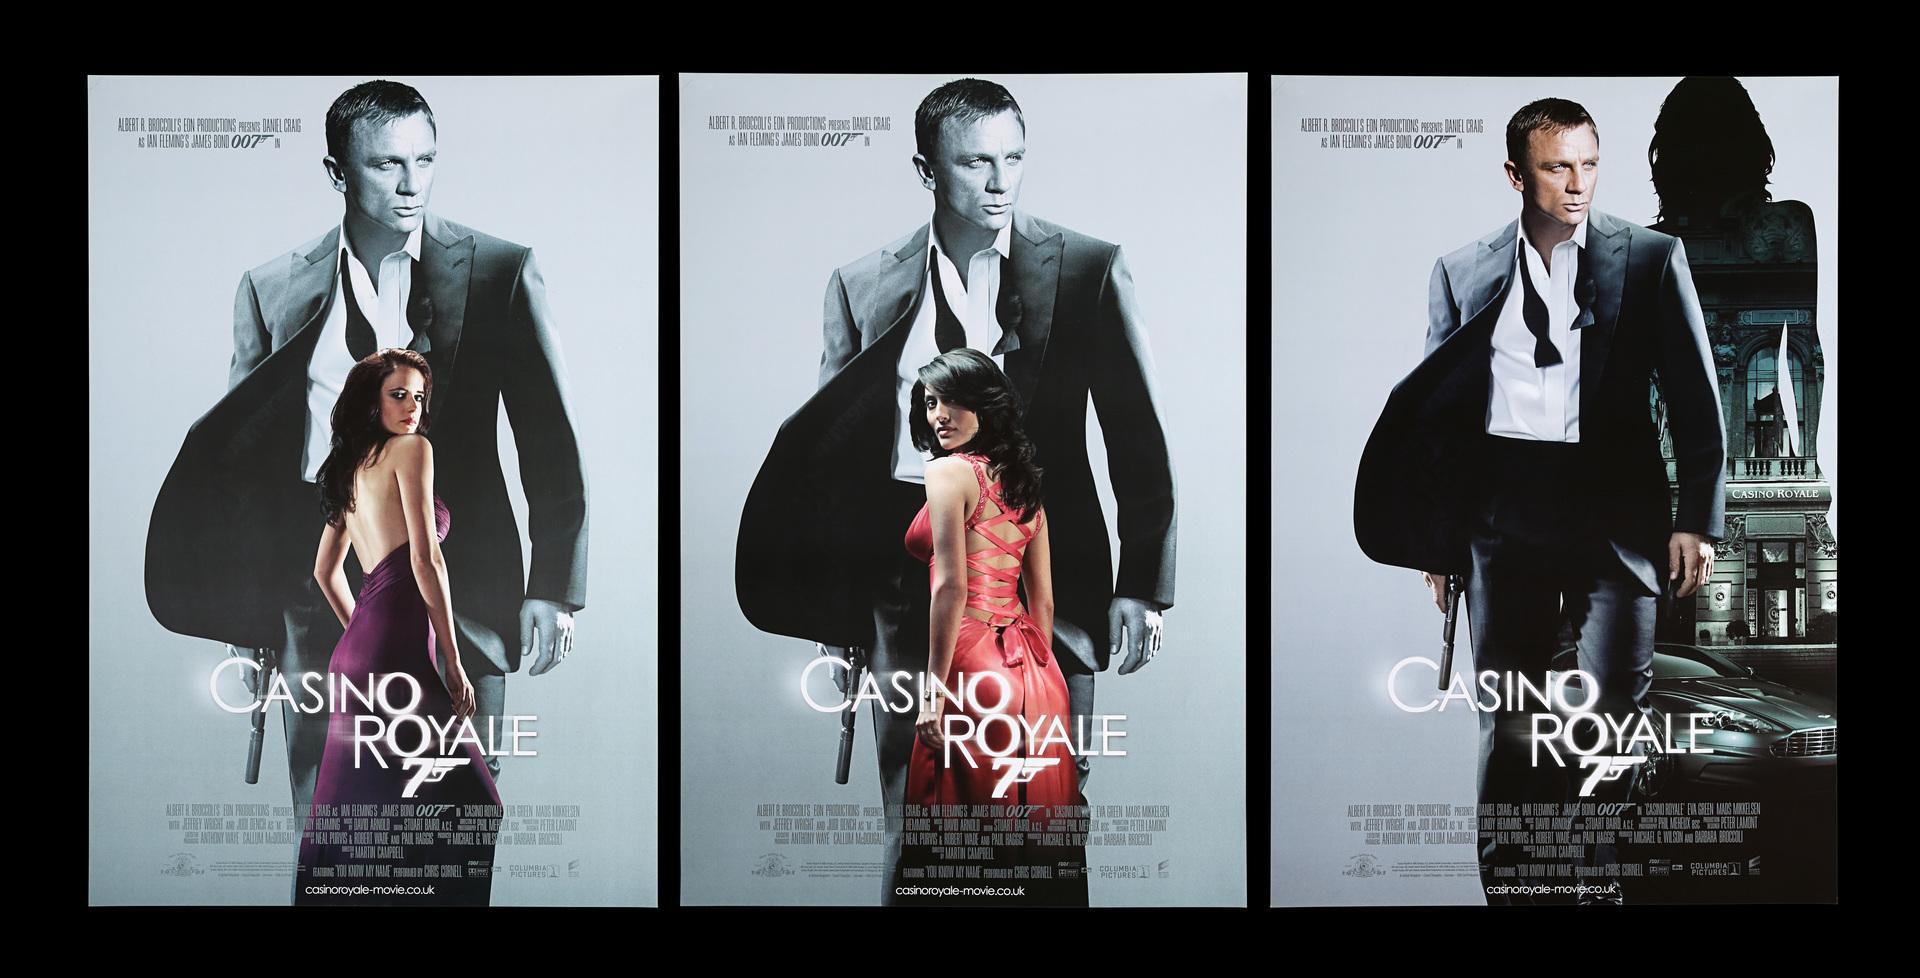 new casino royale 007 james bond film